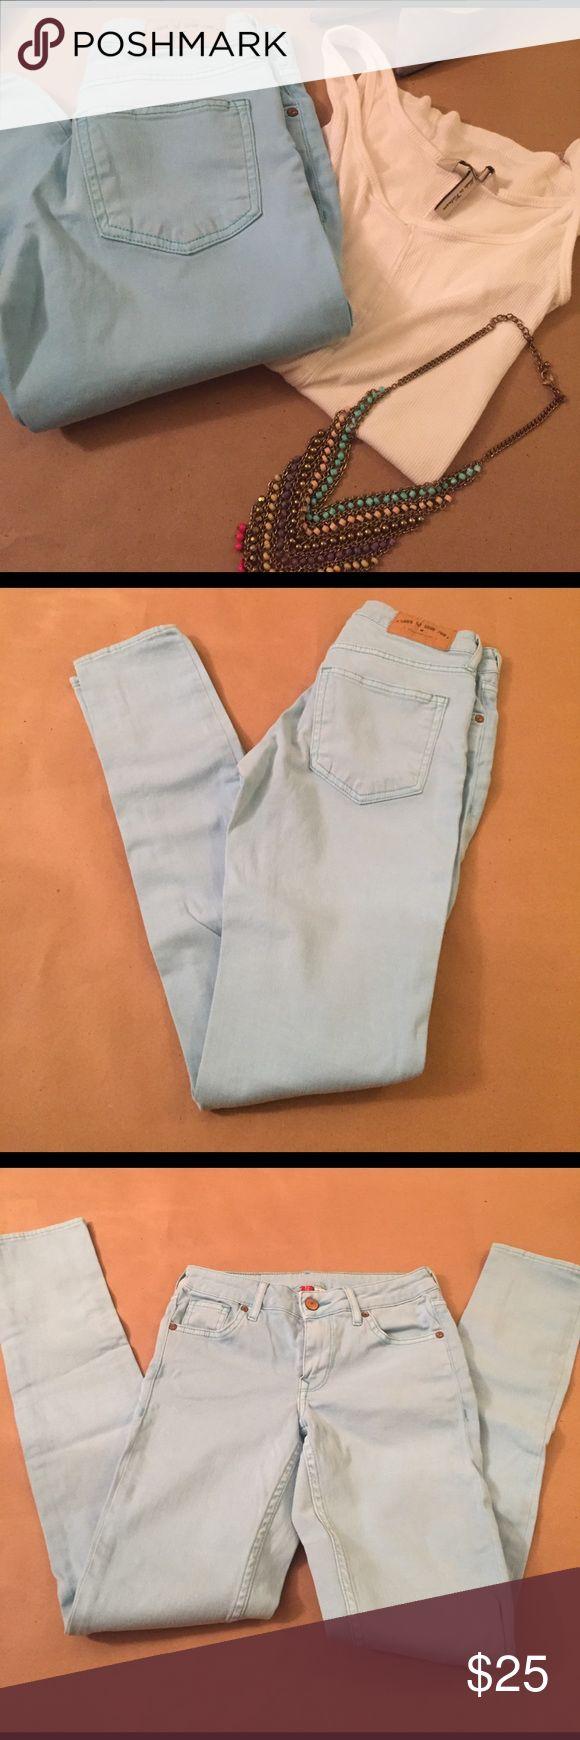 H&M Ready for spring light aqua jeans H&M Ready for spring light aqua jeans 💕 H&M Jeans